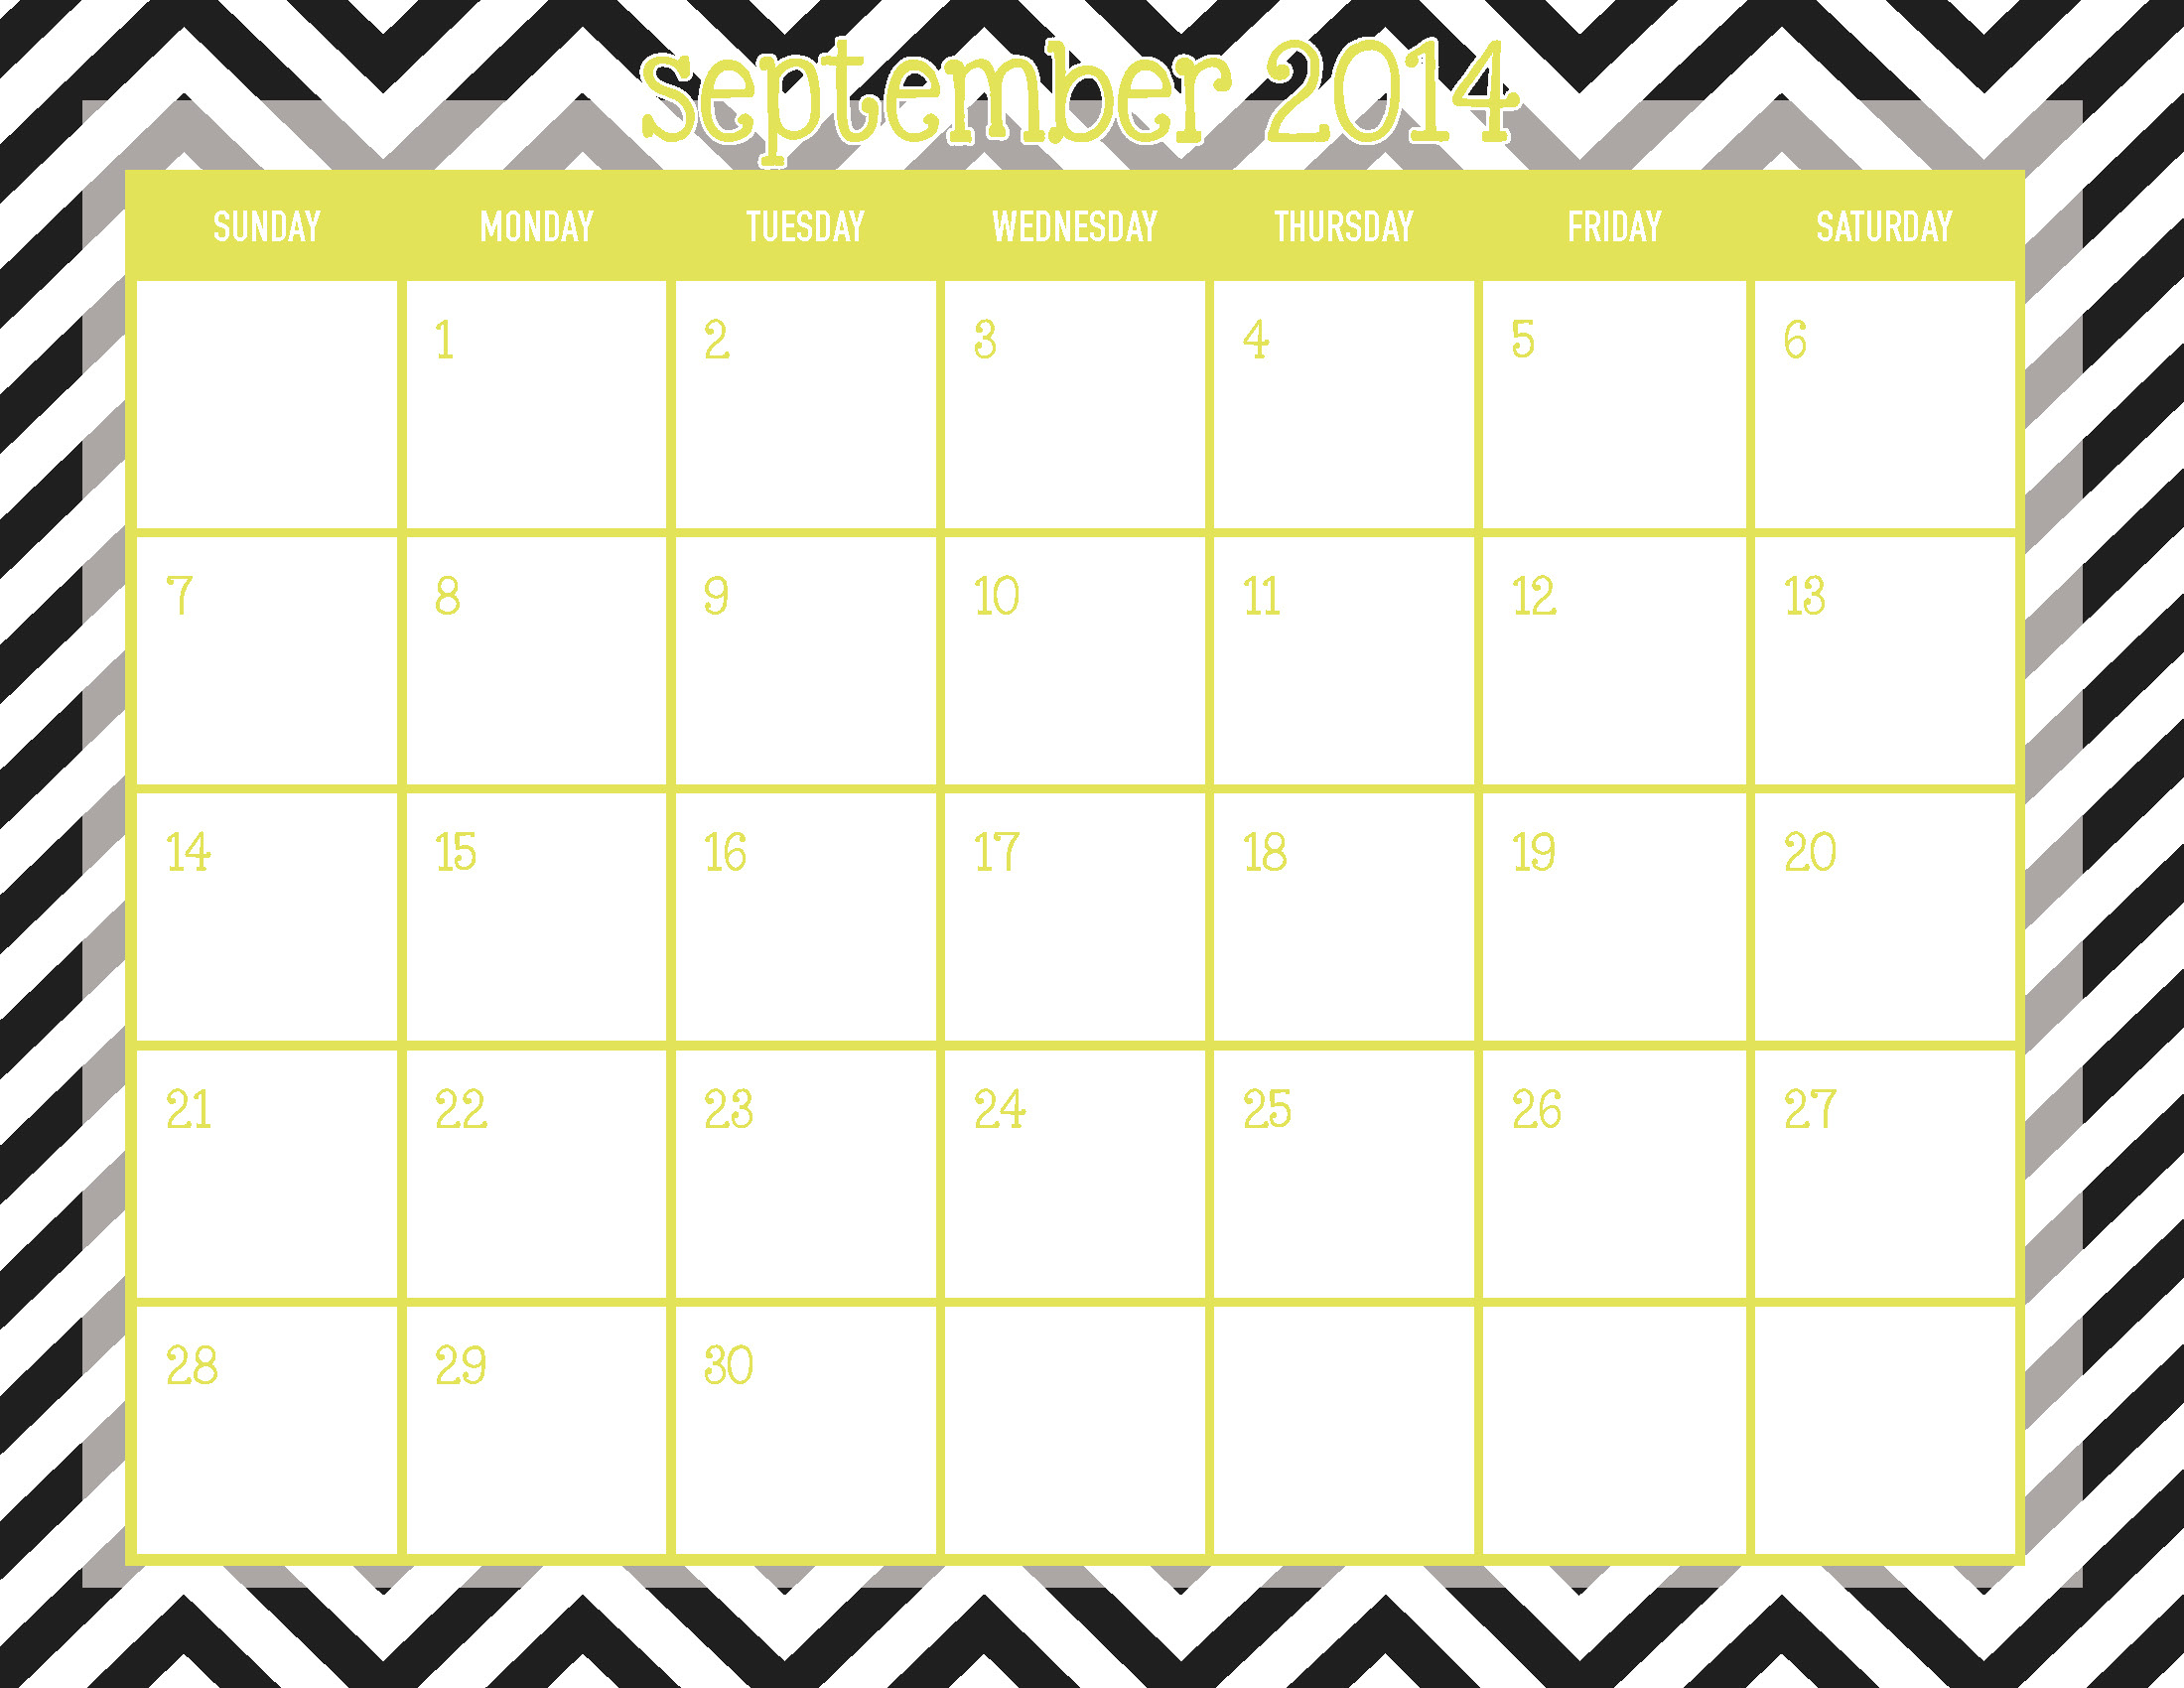 Calendar Ng Manok Panabong | Calendar For Planning with Orakulo Sa Sabong